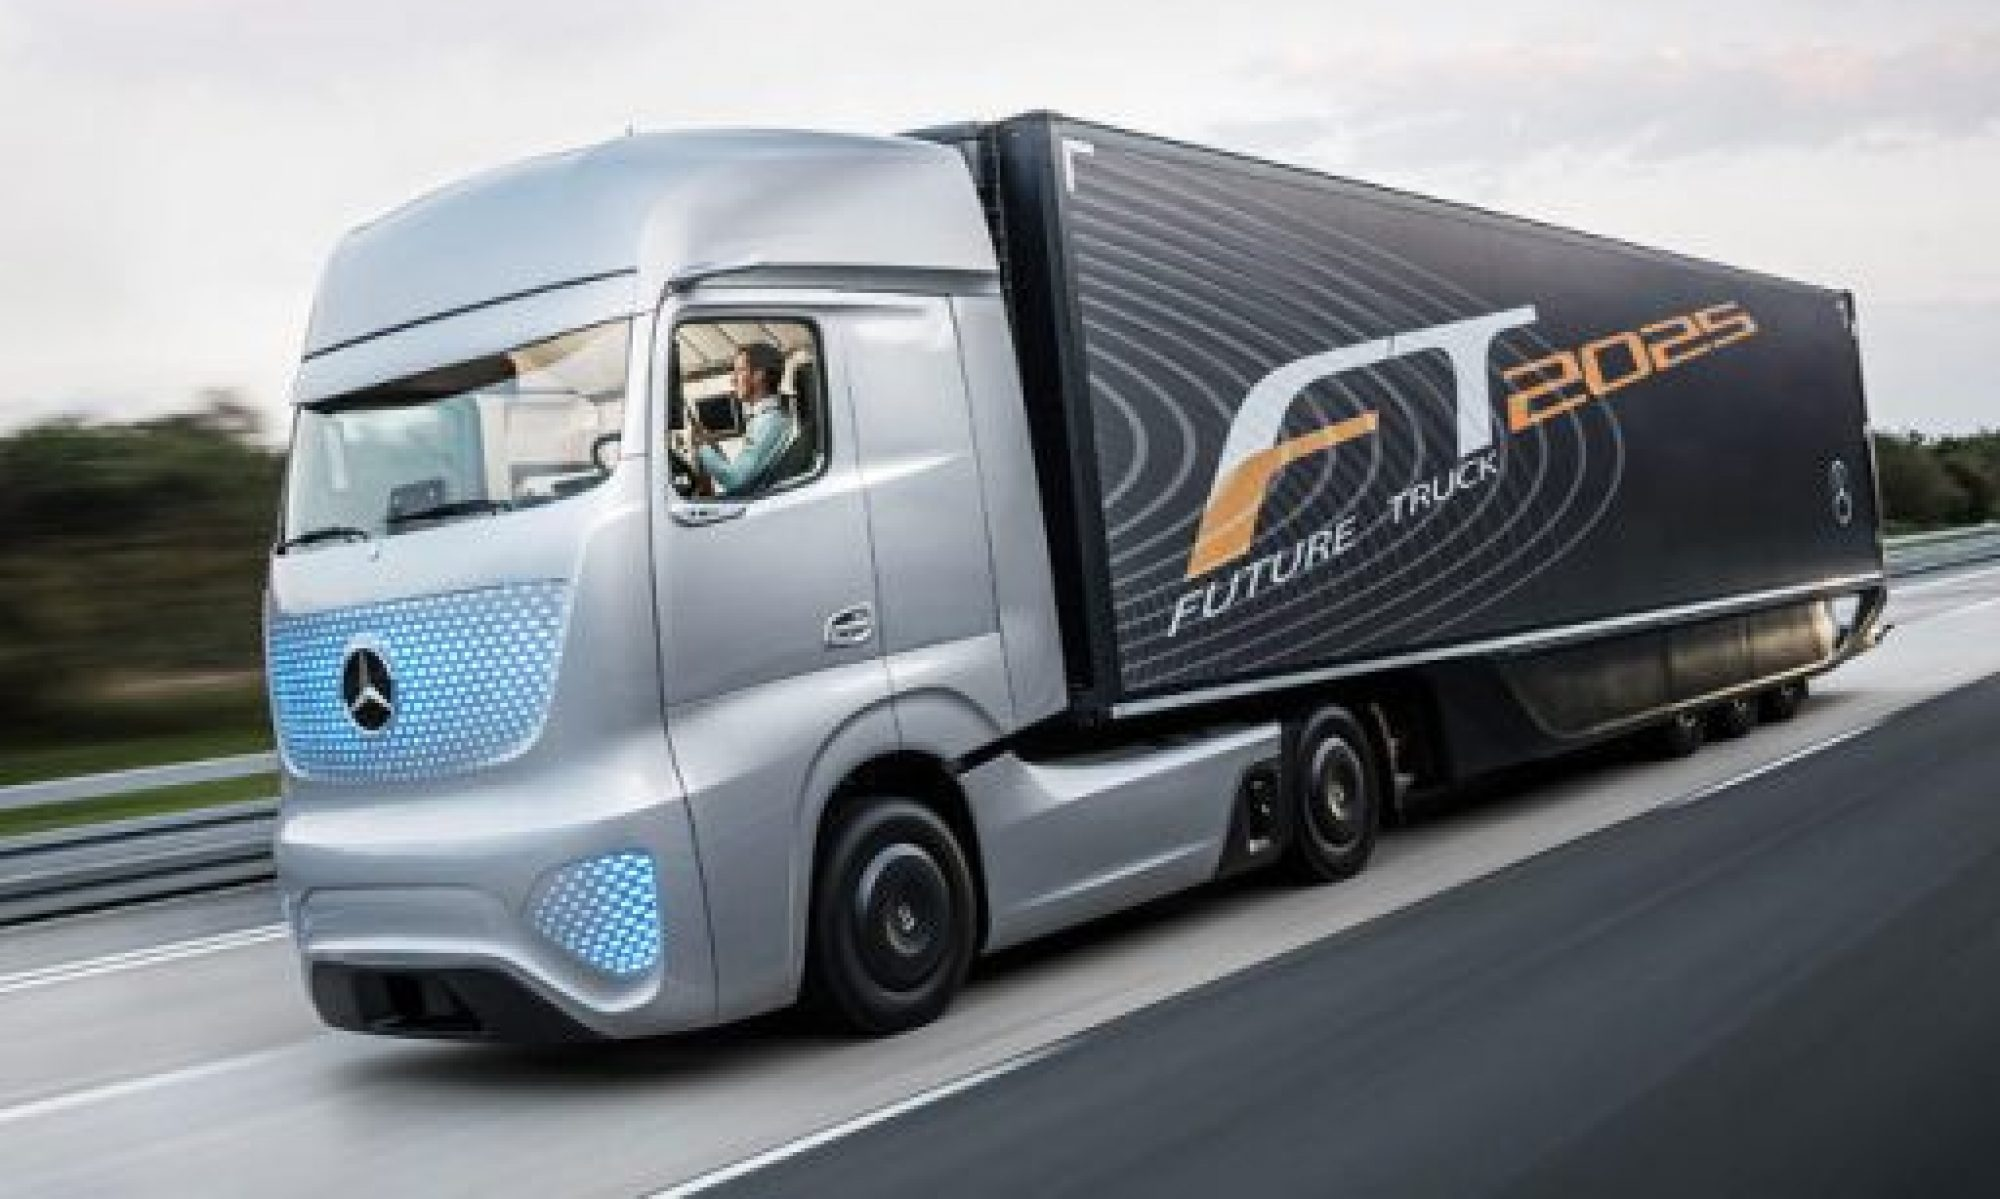 cropped-cropped-01-Mercedes-Benz-Autonomous-Truck-Logistic-Future-Truck-2025-1180x6862-1180x6861.jpg